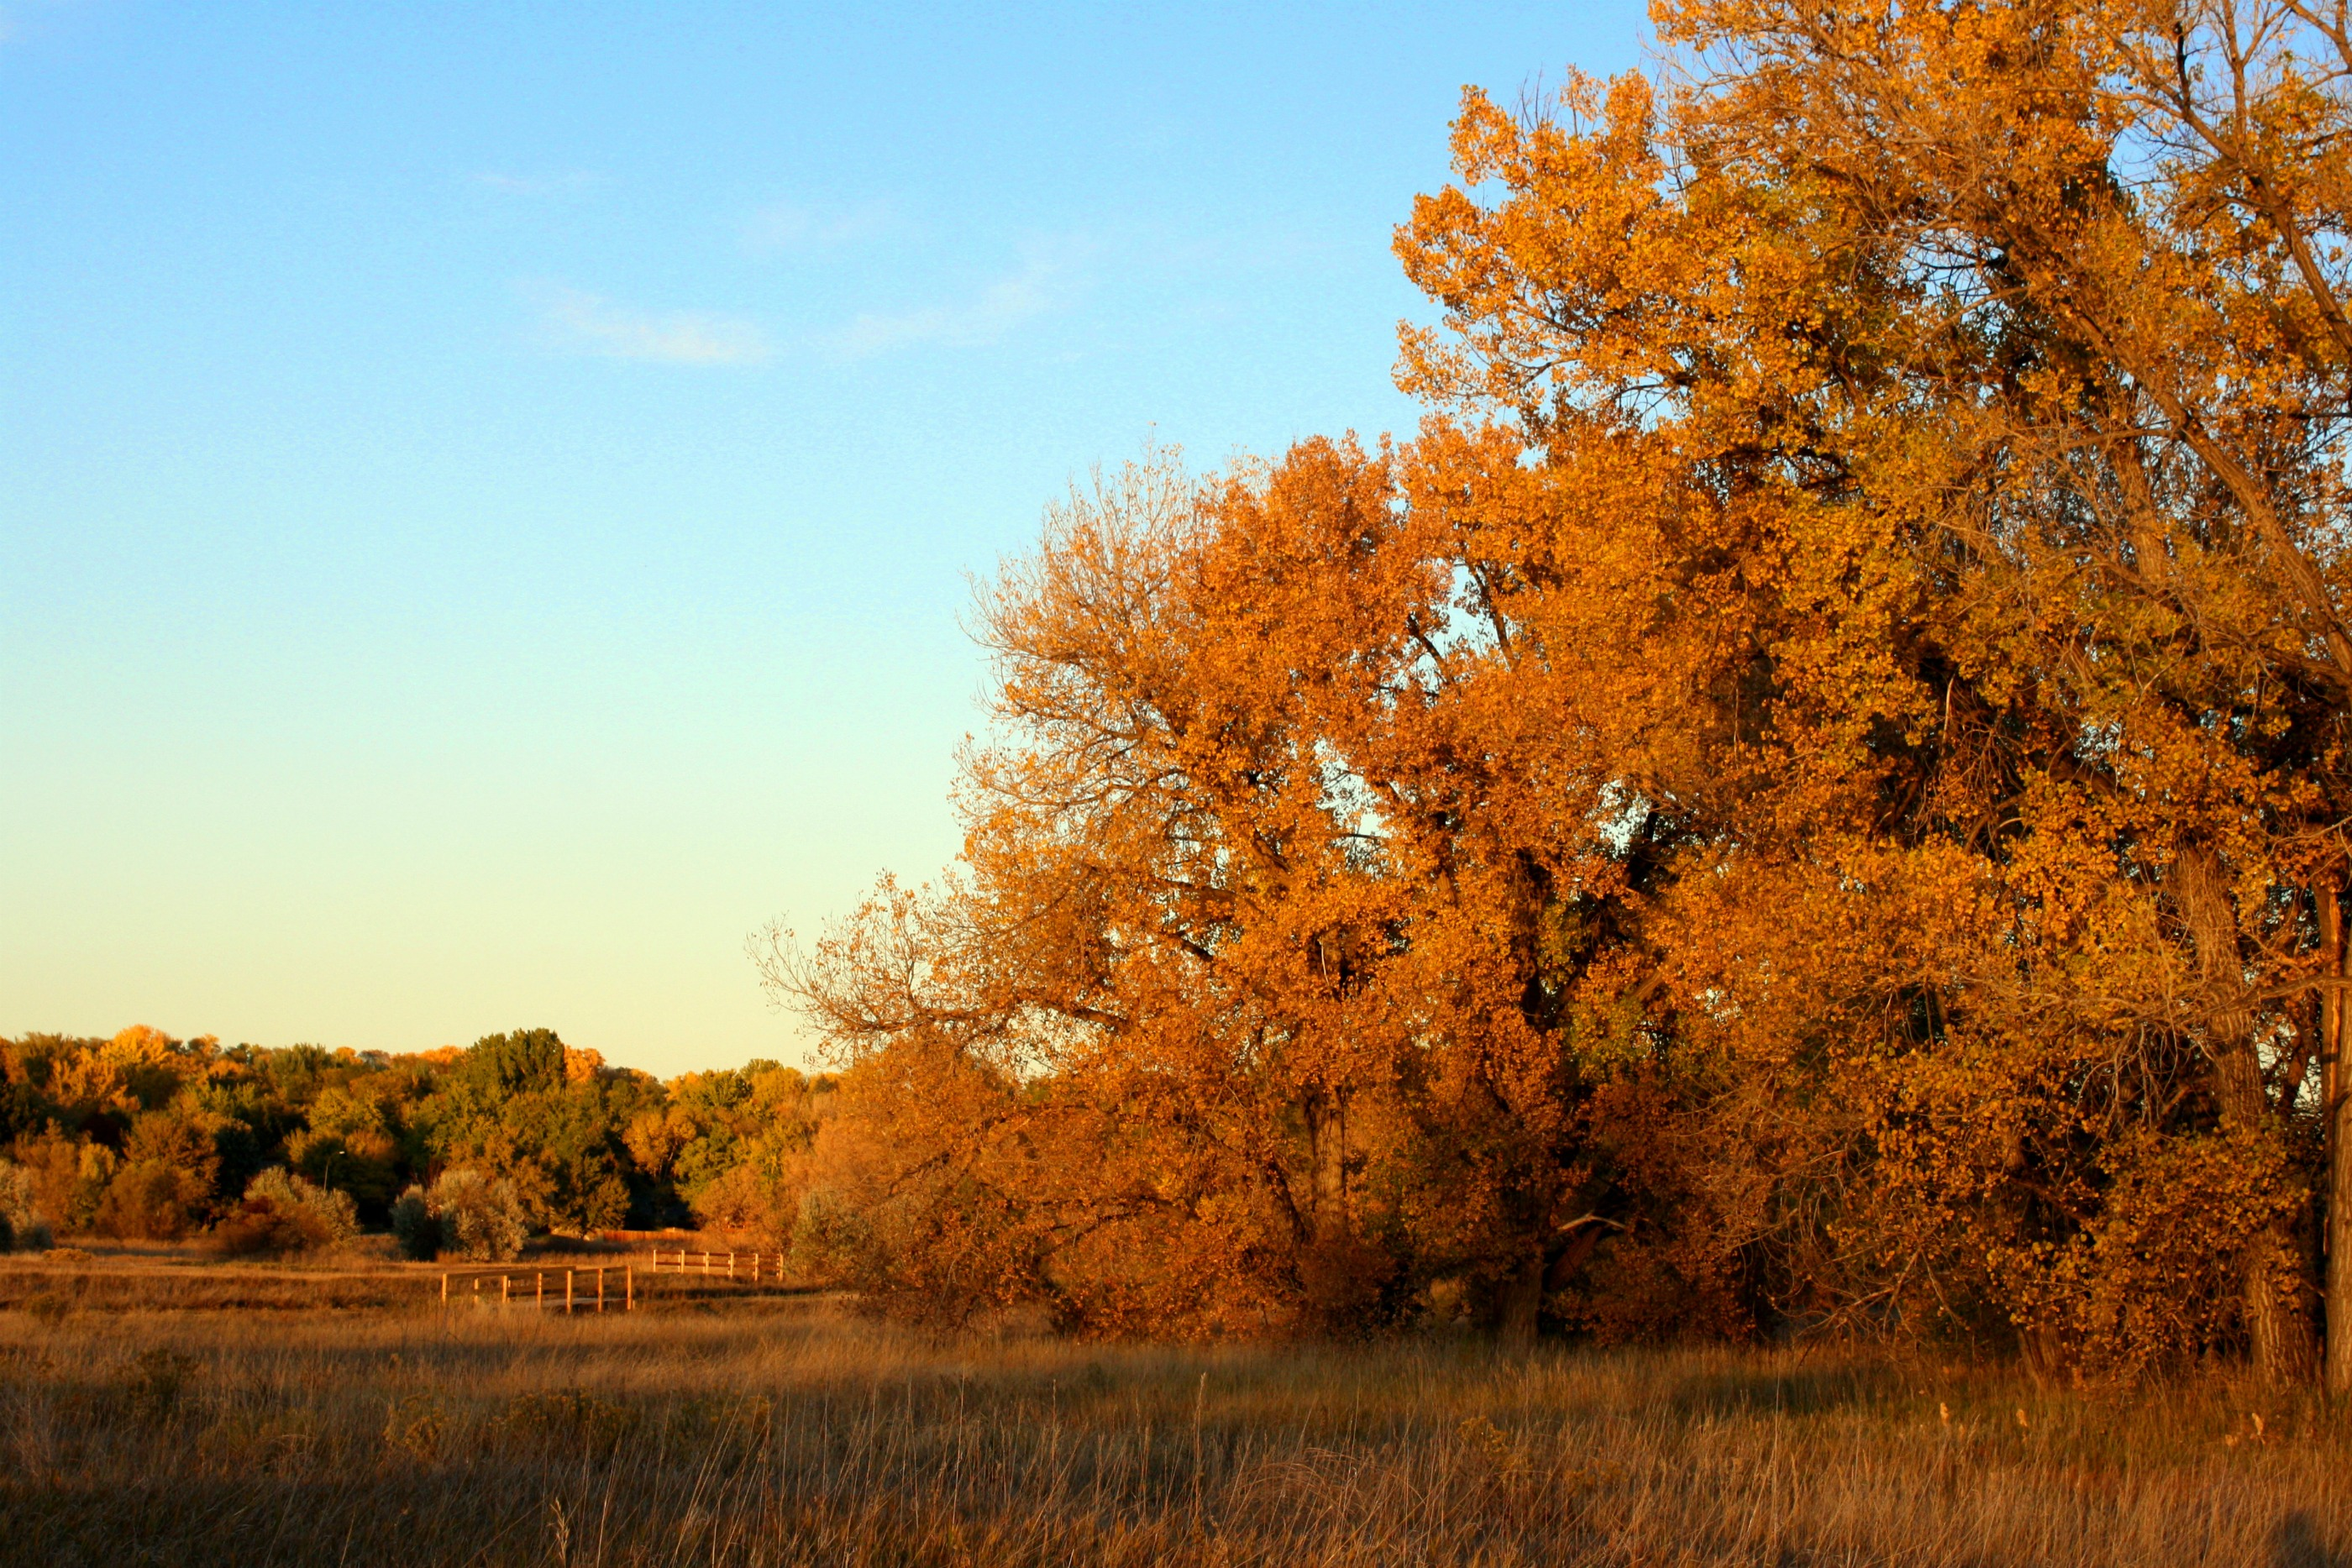 File:Beautiful Autumn Day.jpg